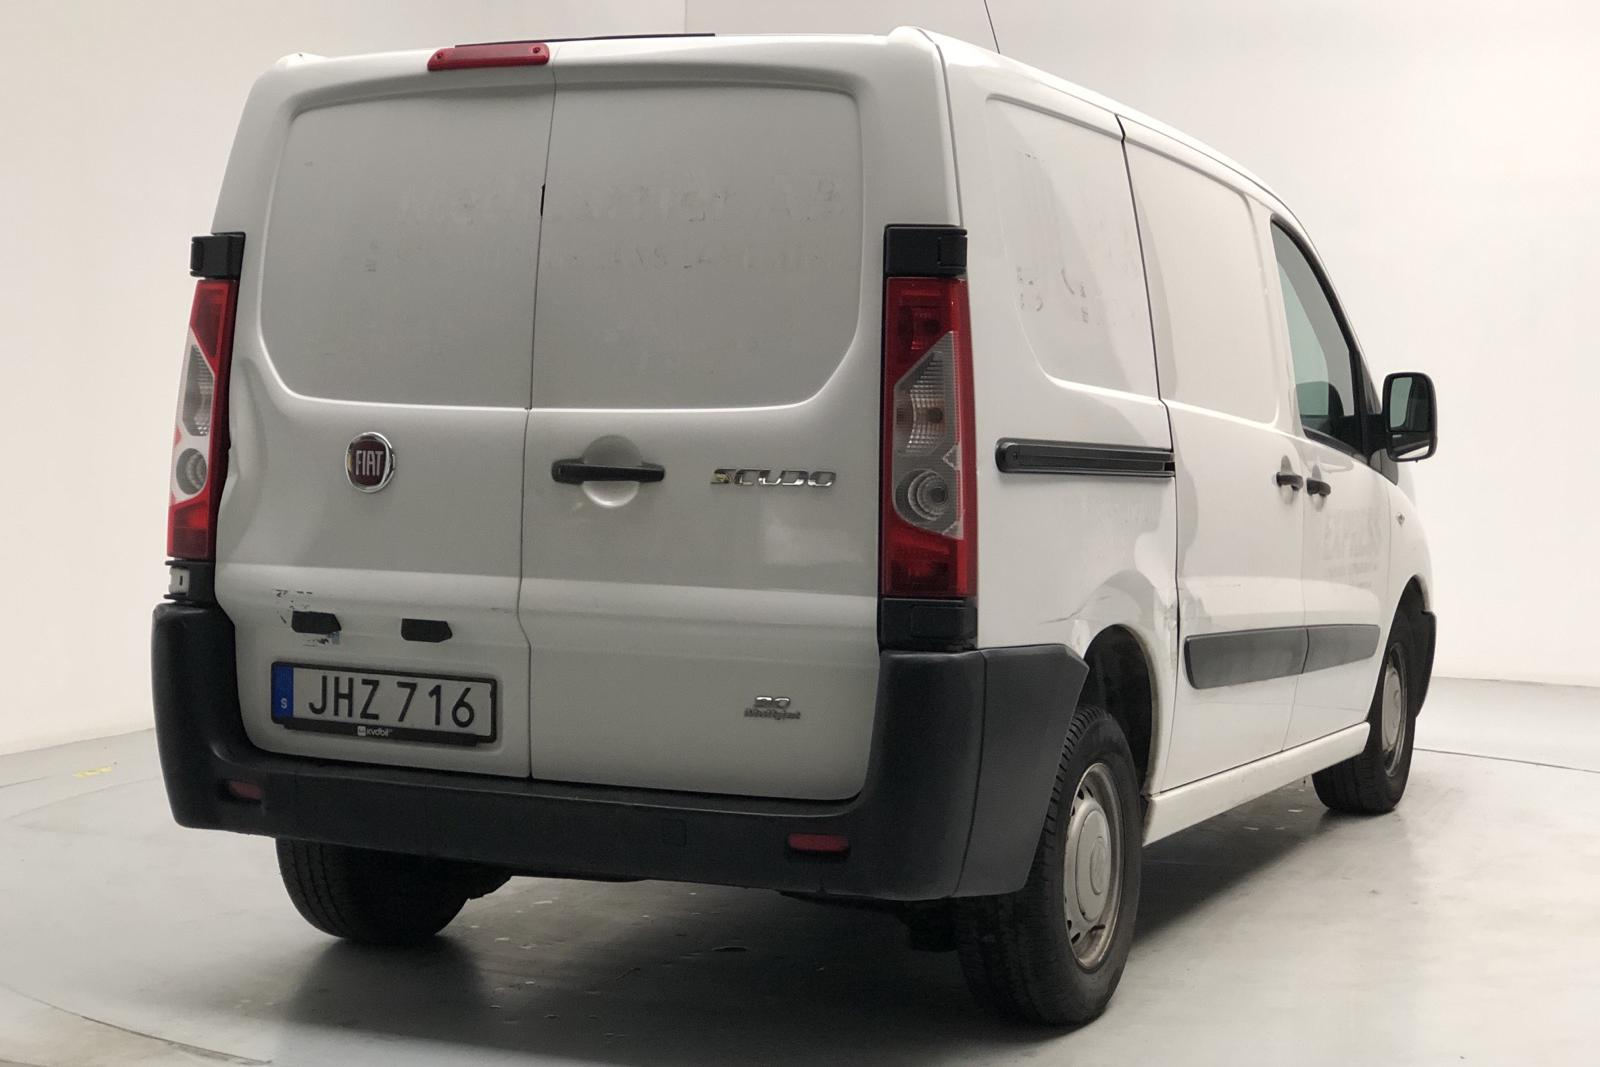 Fiat Scudo 1.6 MJT (90hk) - 175 130 km - Manual - white - 2014